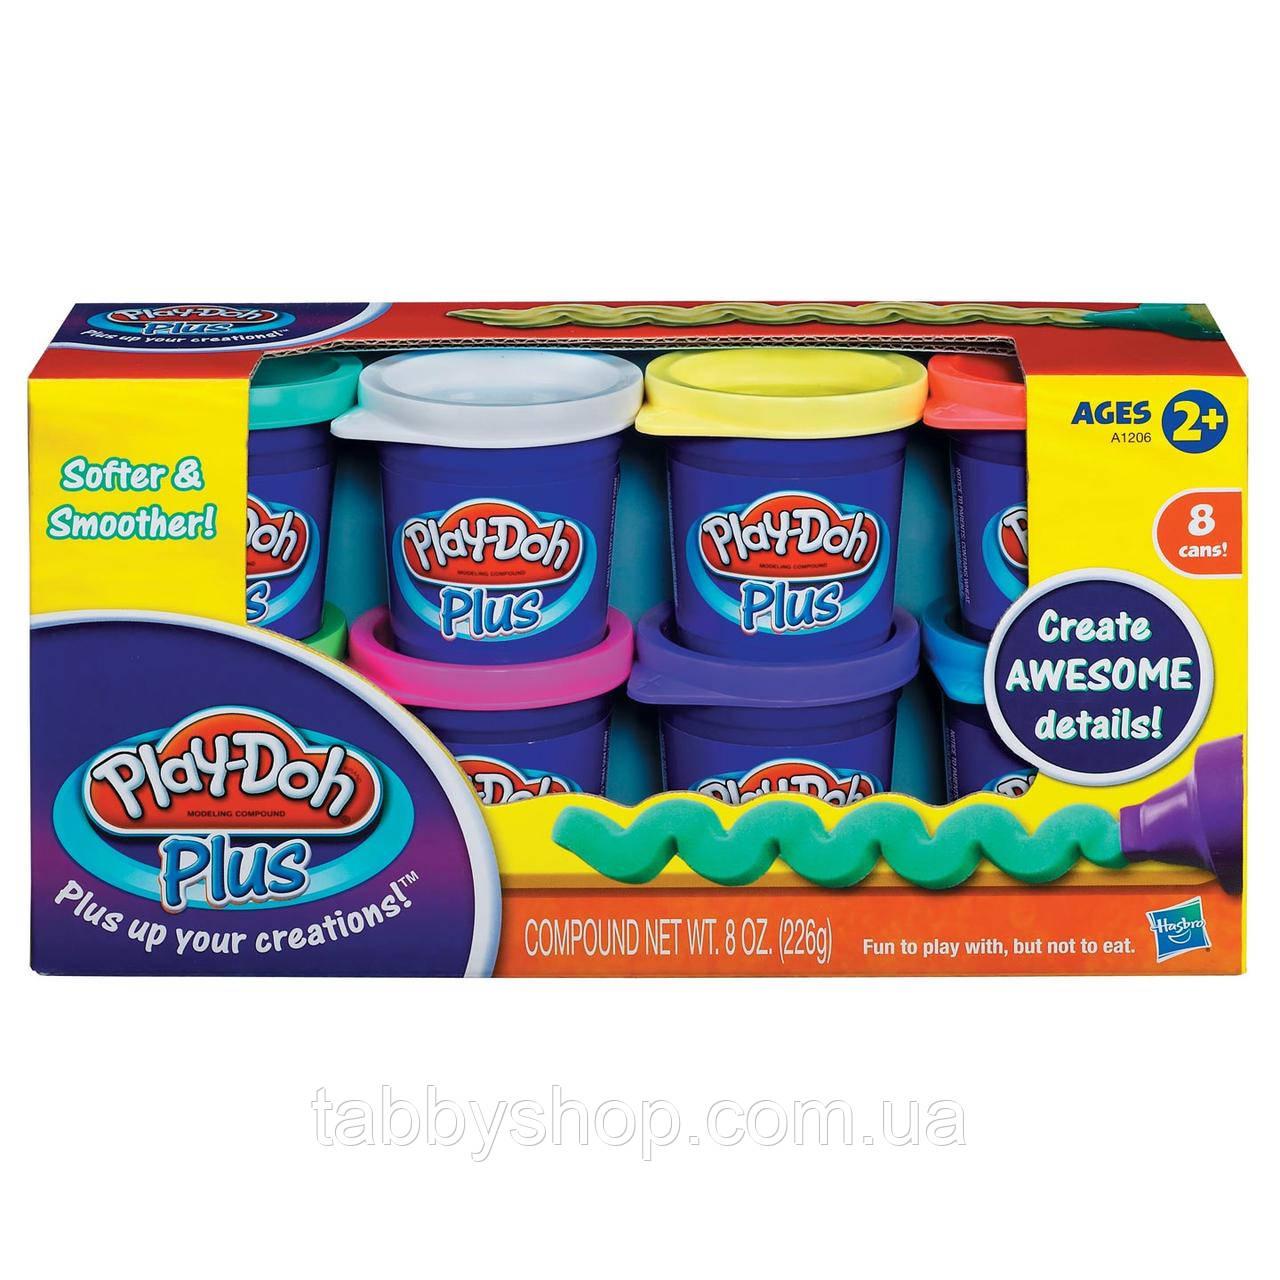 Набор пластилина из 8-ми банок HASBRO Play Doh PLUS